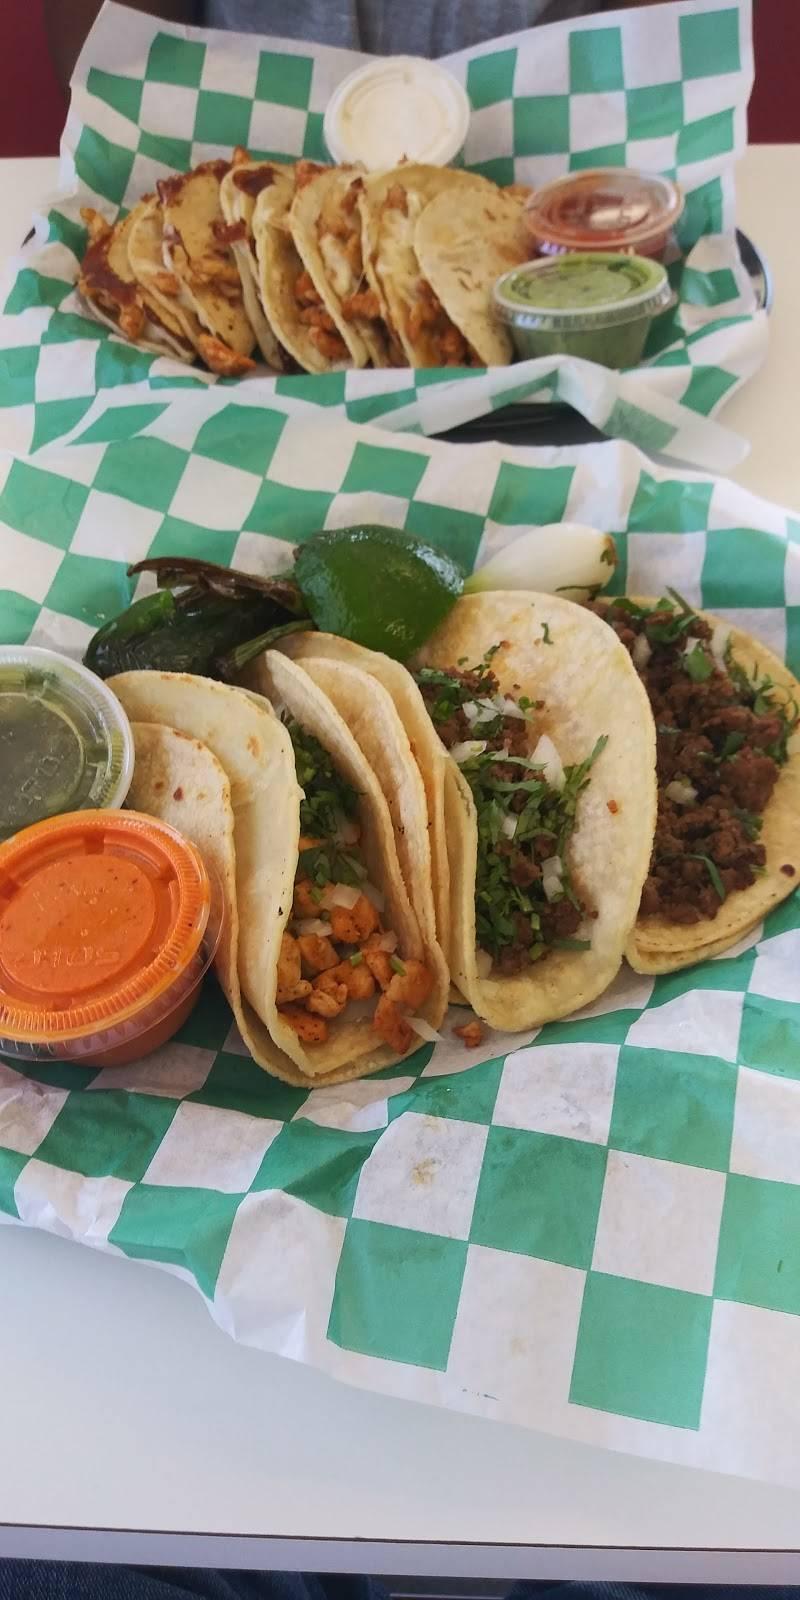 El Alebrije Mexican Food | restaurant | 6300 New Jersey Ave, Wildwood Crest, NJ 08260, USA | 6098543646 OR +1 609-854-3646